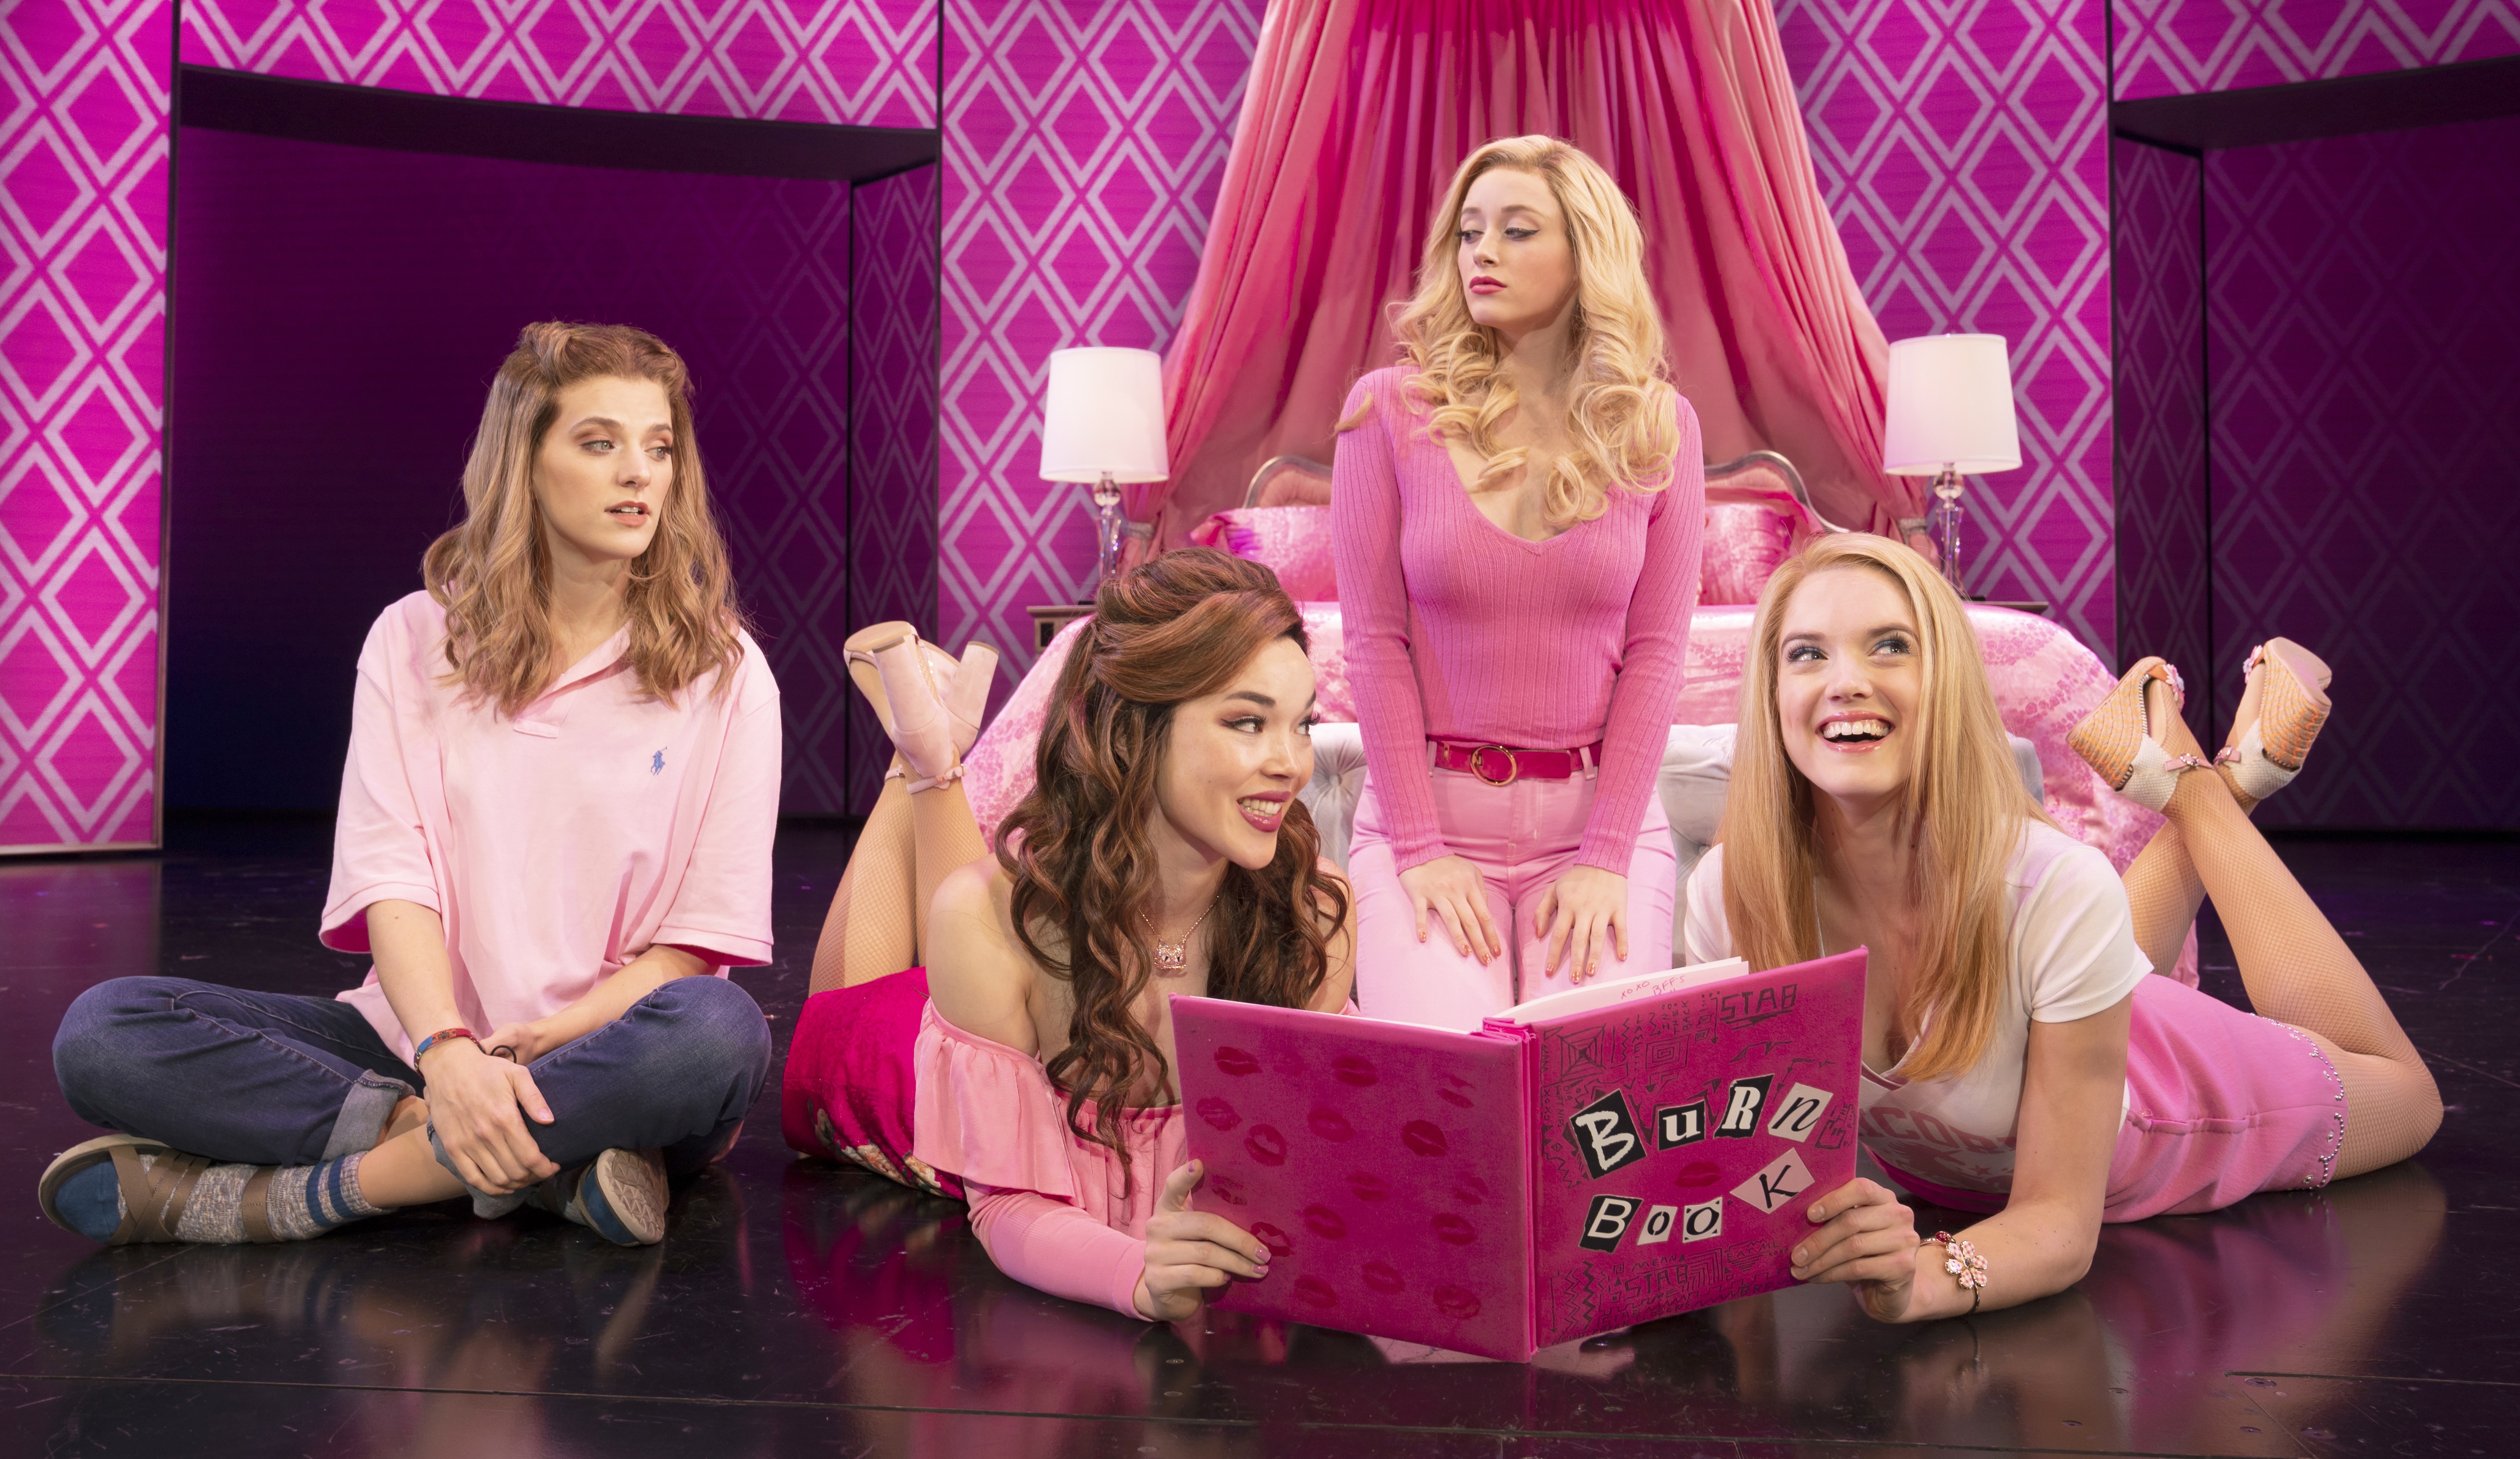 Danielle Wade (Cady Heron), Megan Masako Haley (Gretchen Wieners), Mariah Rose Faith (Regina George), and Jonalyn Saxer (Karen Smith) in the National Touring Company of Mean Girls Credit: © 2019 Joan Marcus